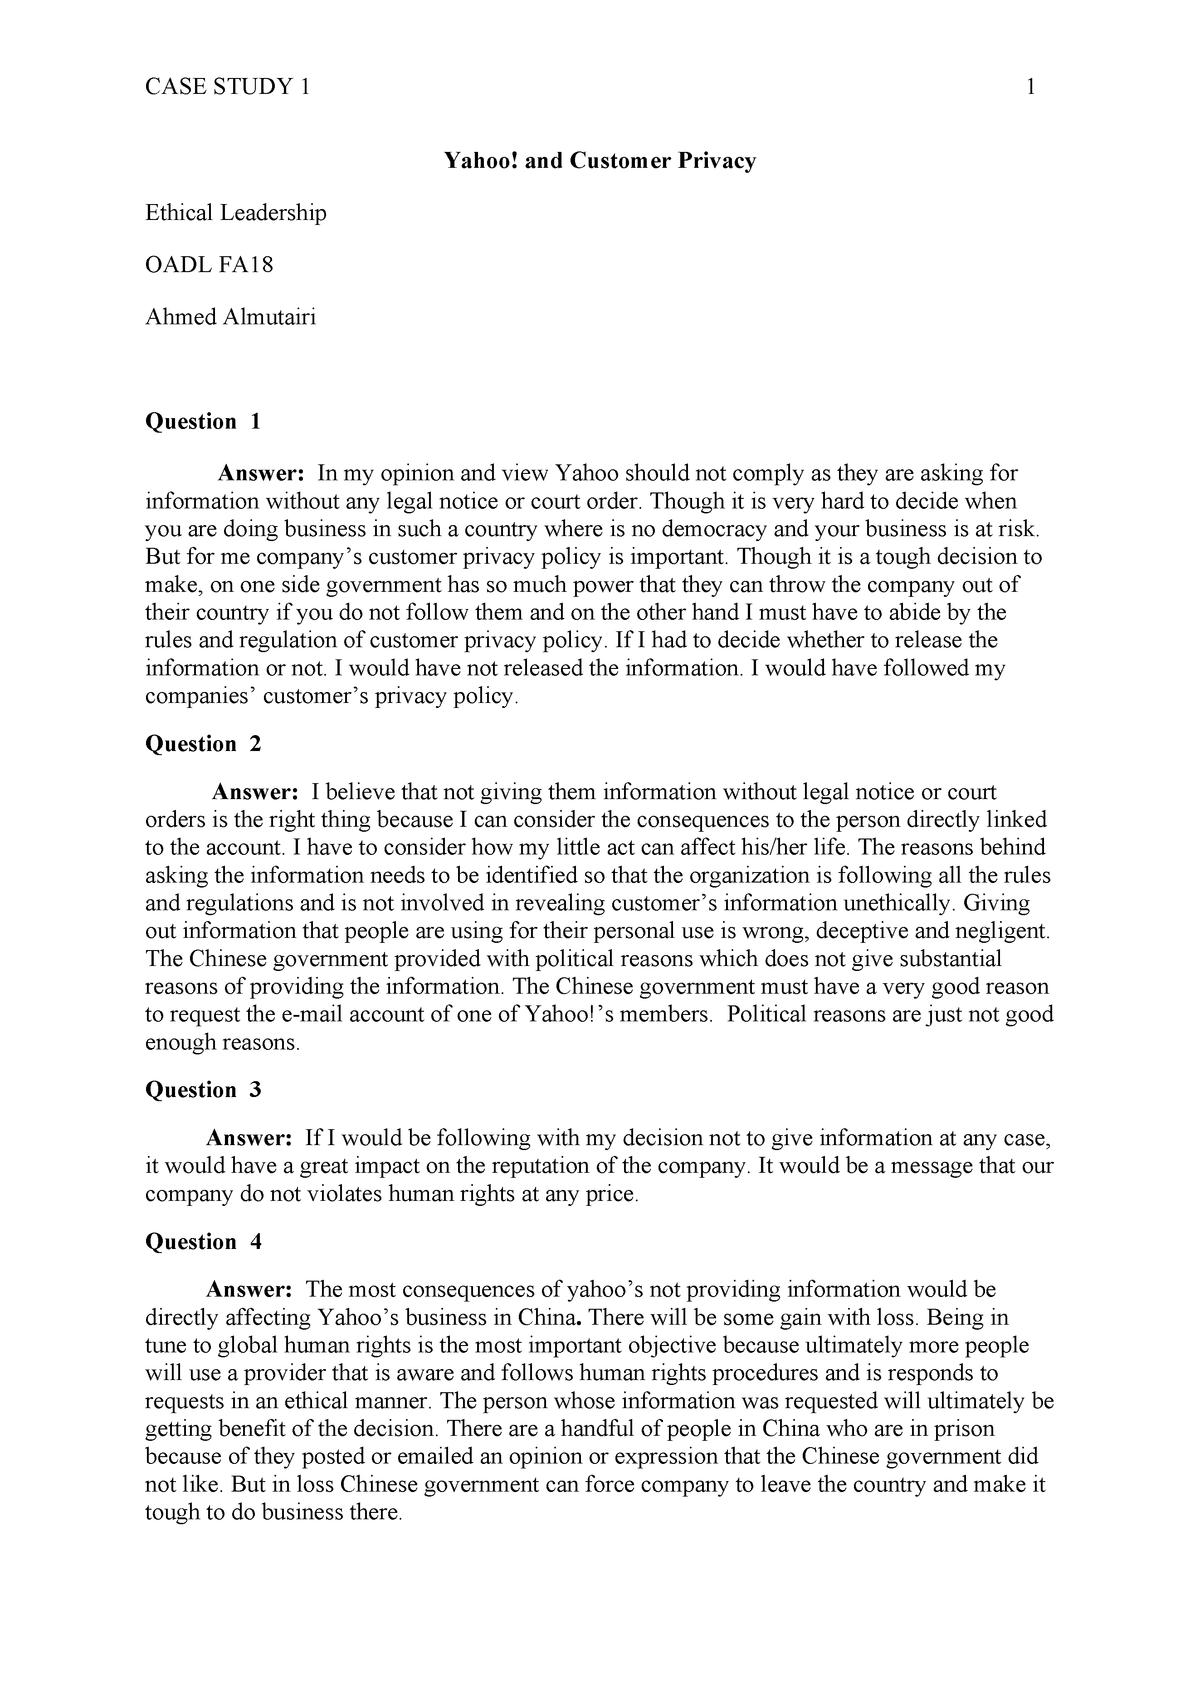 Yahoo CASE Study Ahmed Almutairi - OADL FA18: Ethical